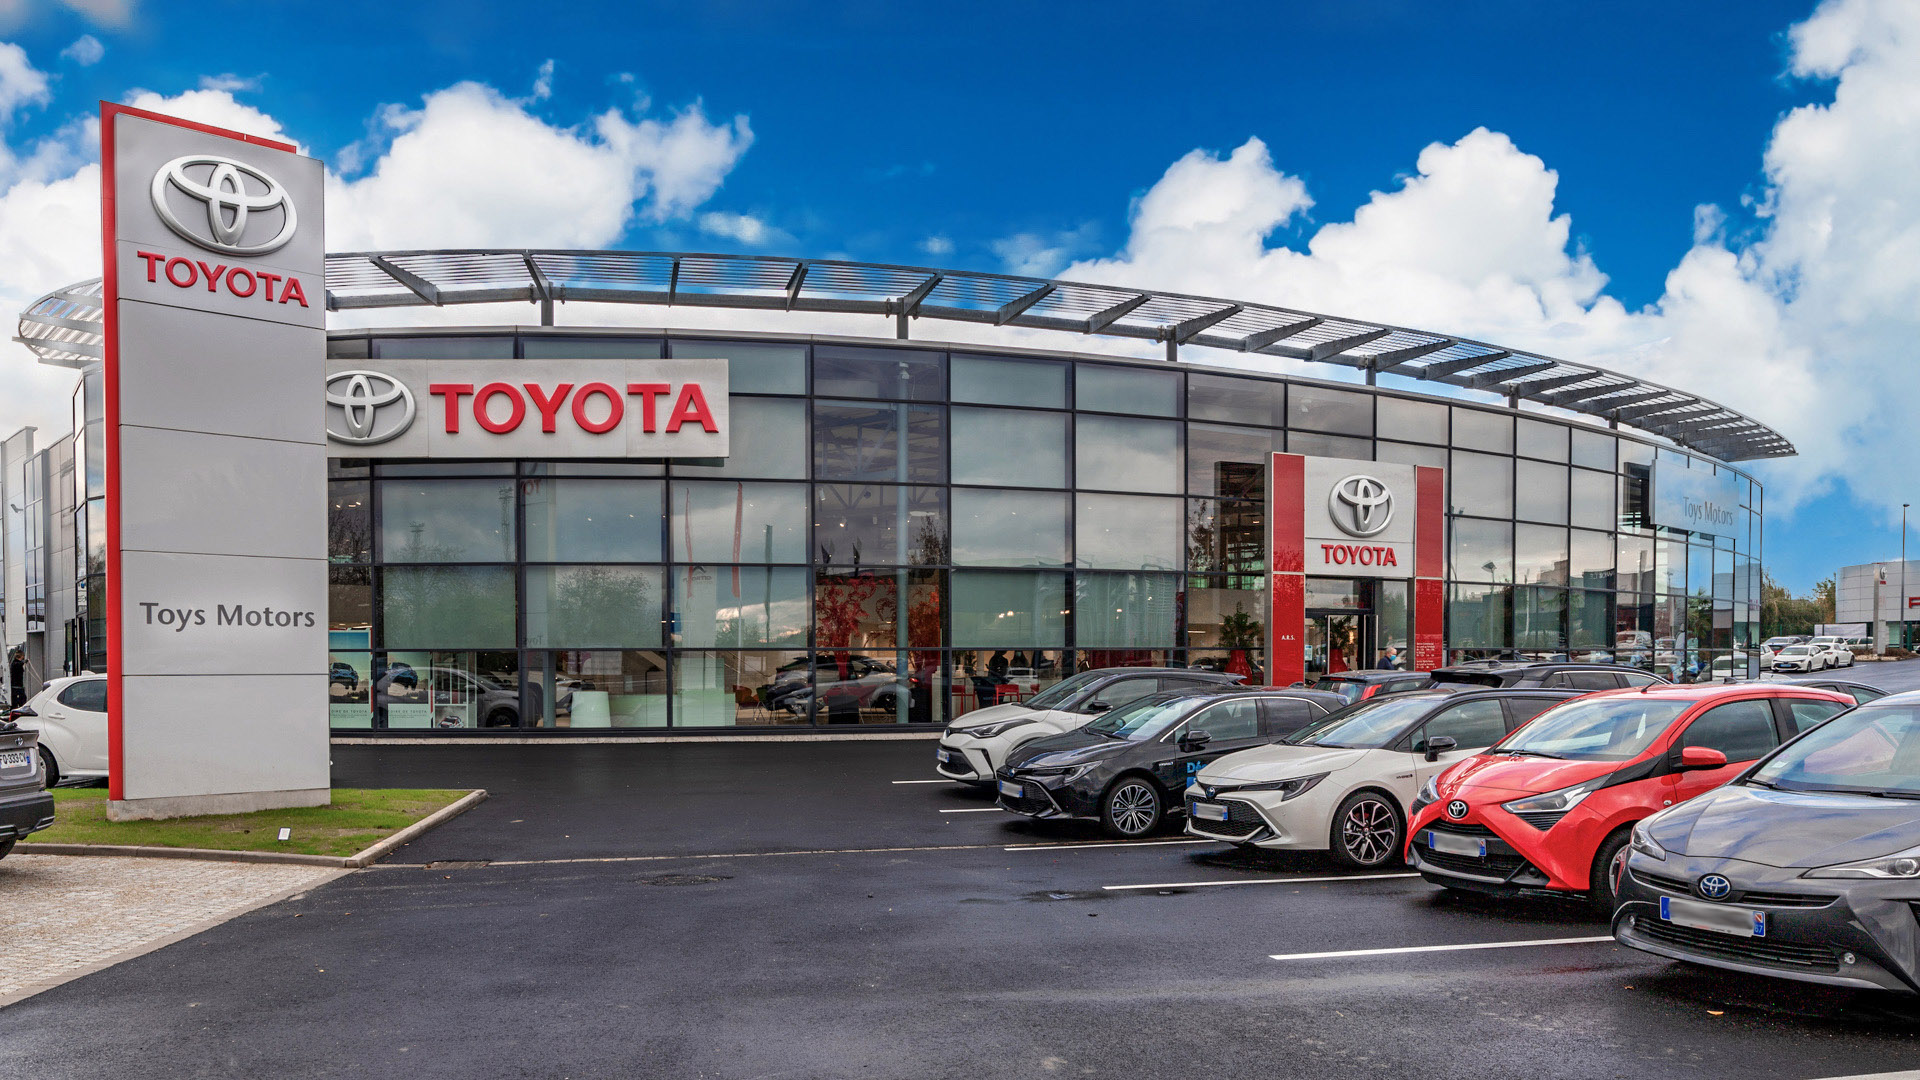 Toyota - Toys Motors - Hoenheim